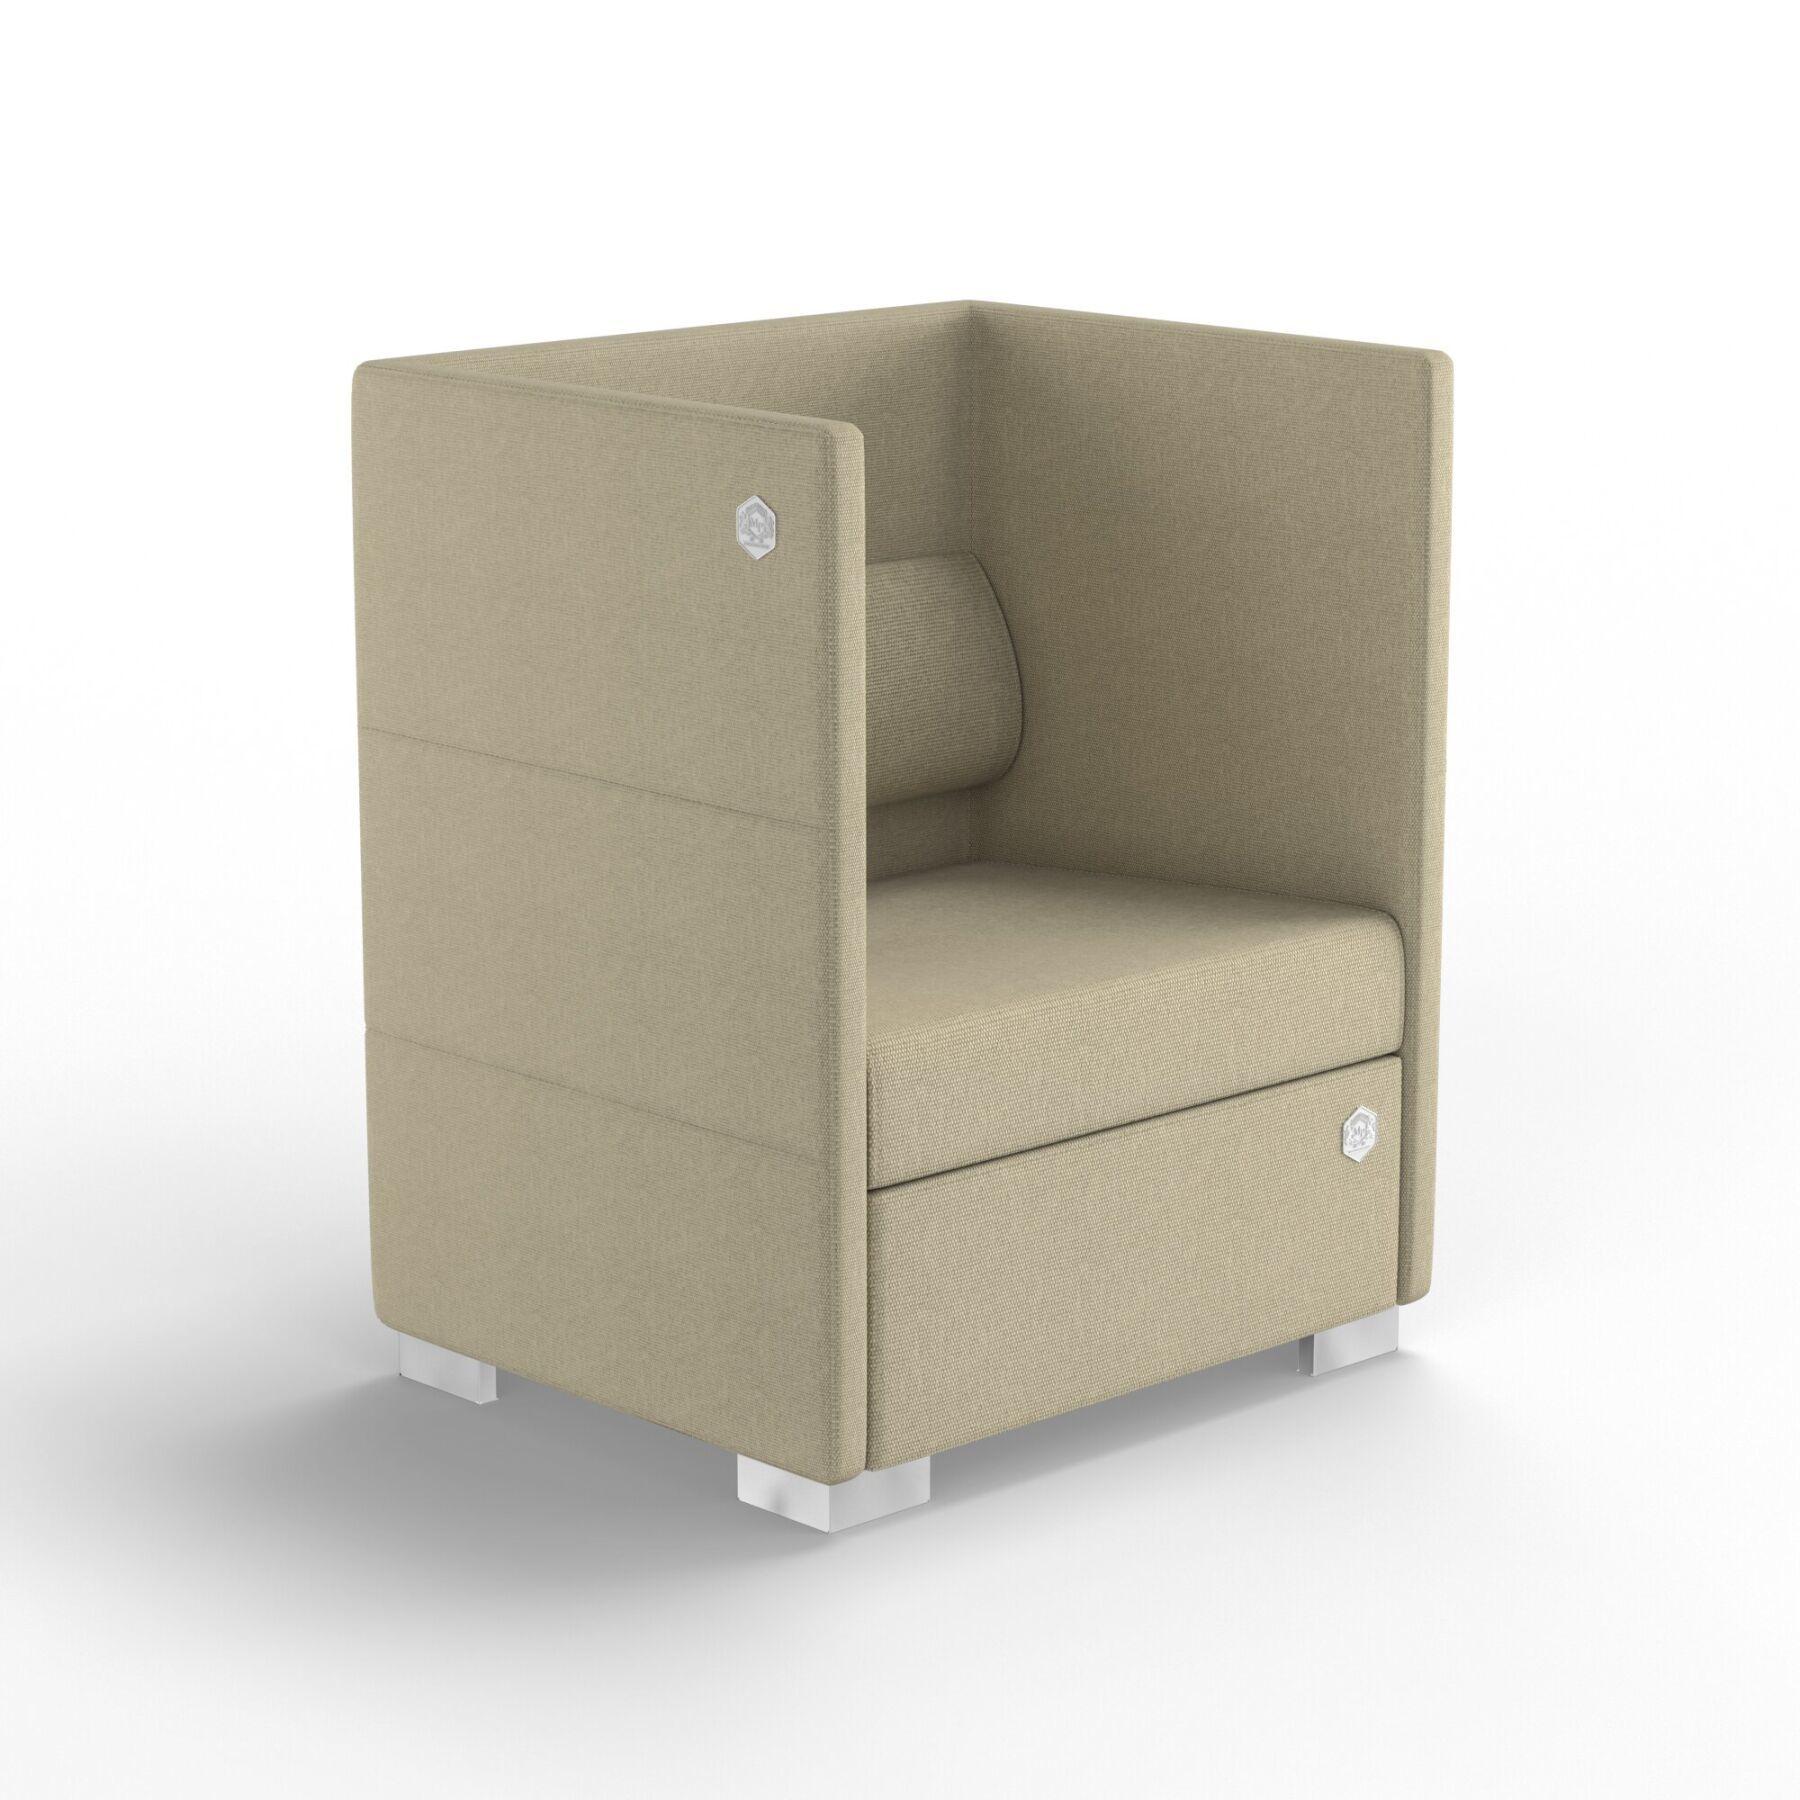 Мягкое кресло KULIK SYSTEM CONFERENCE Ткань 1